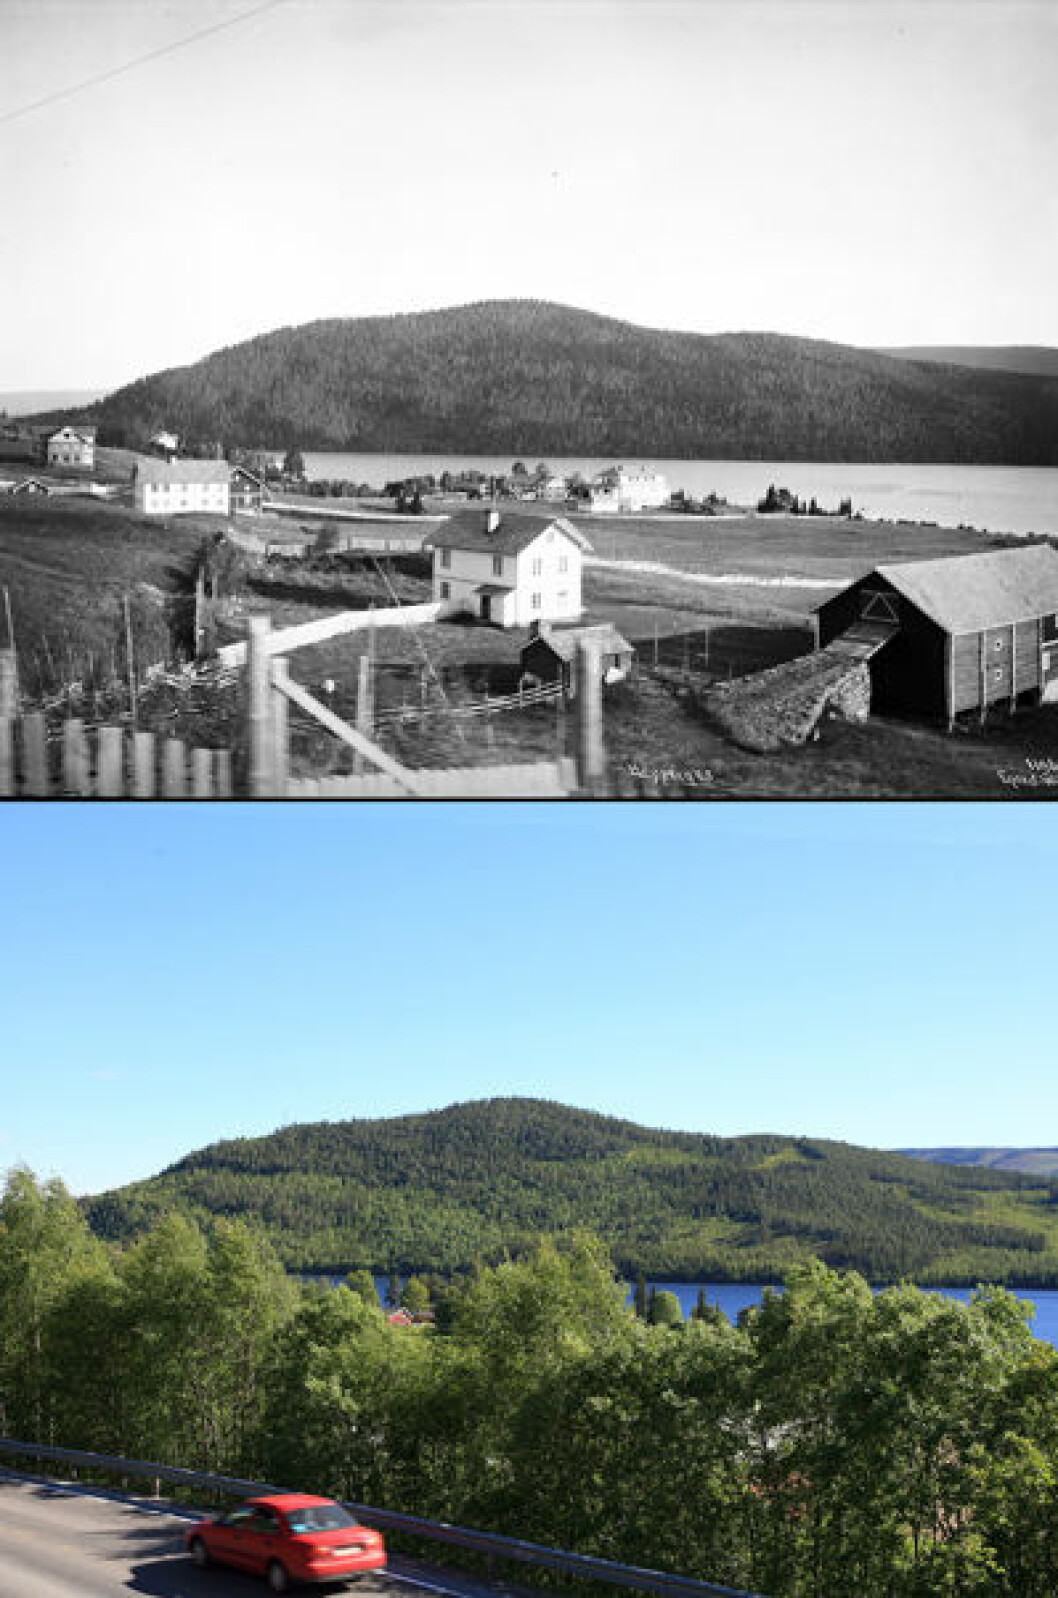 1910 og 2010: Fra Heggenes i Øystre-Slidre, Oppland.Foto: Anders Beer Wilse/Oscar Puschmann